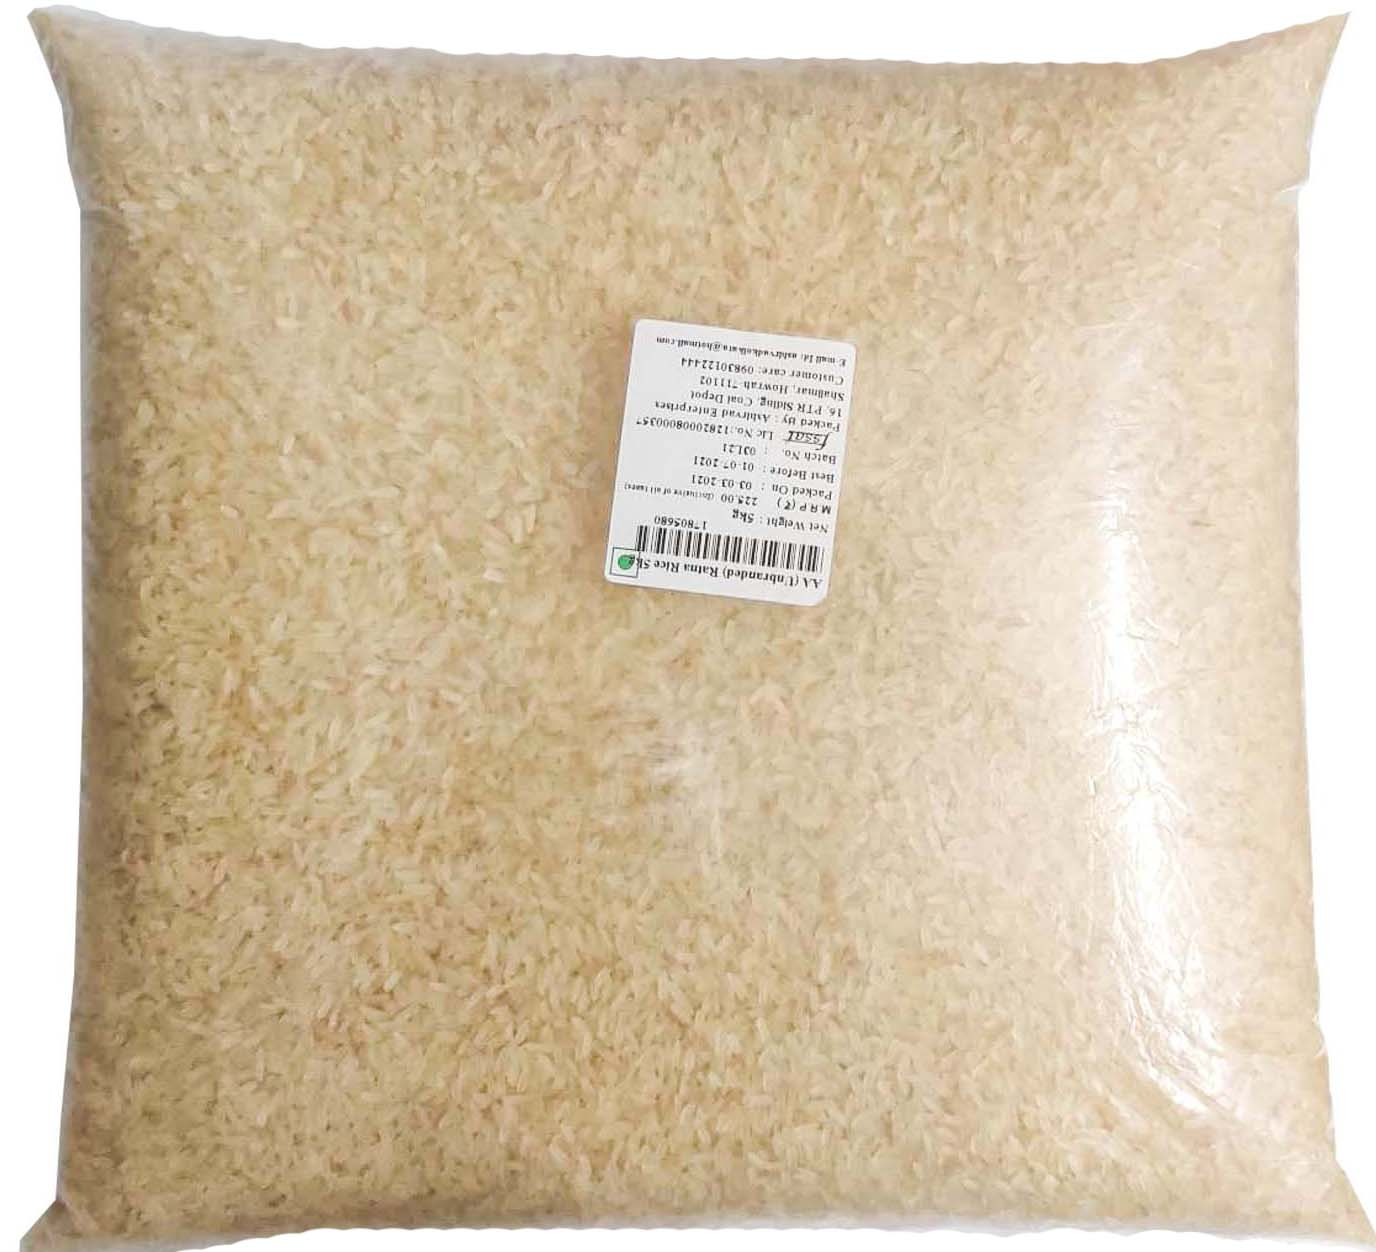 AA (Unbranded) Ratna Rice